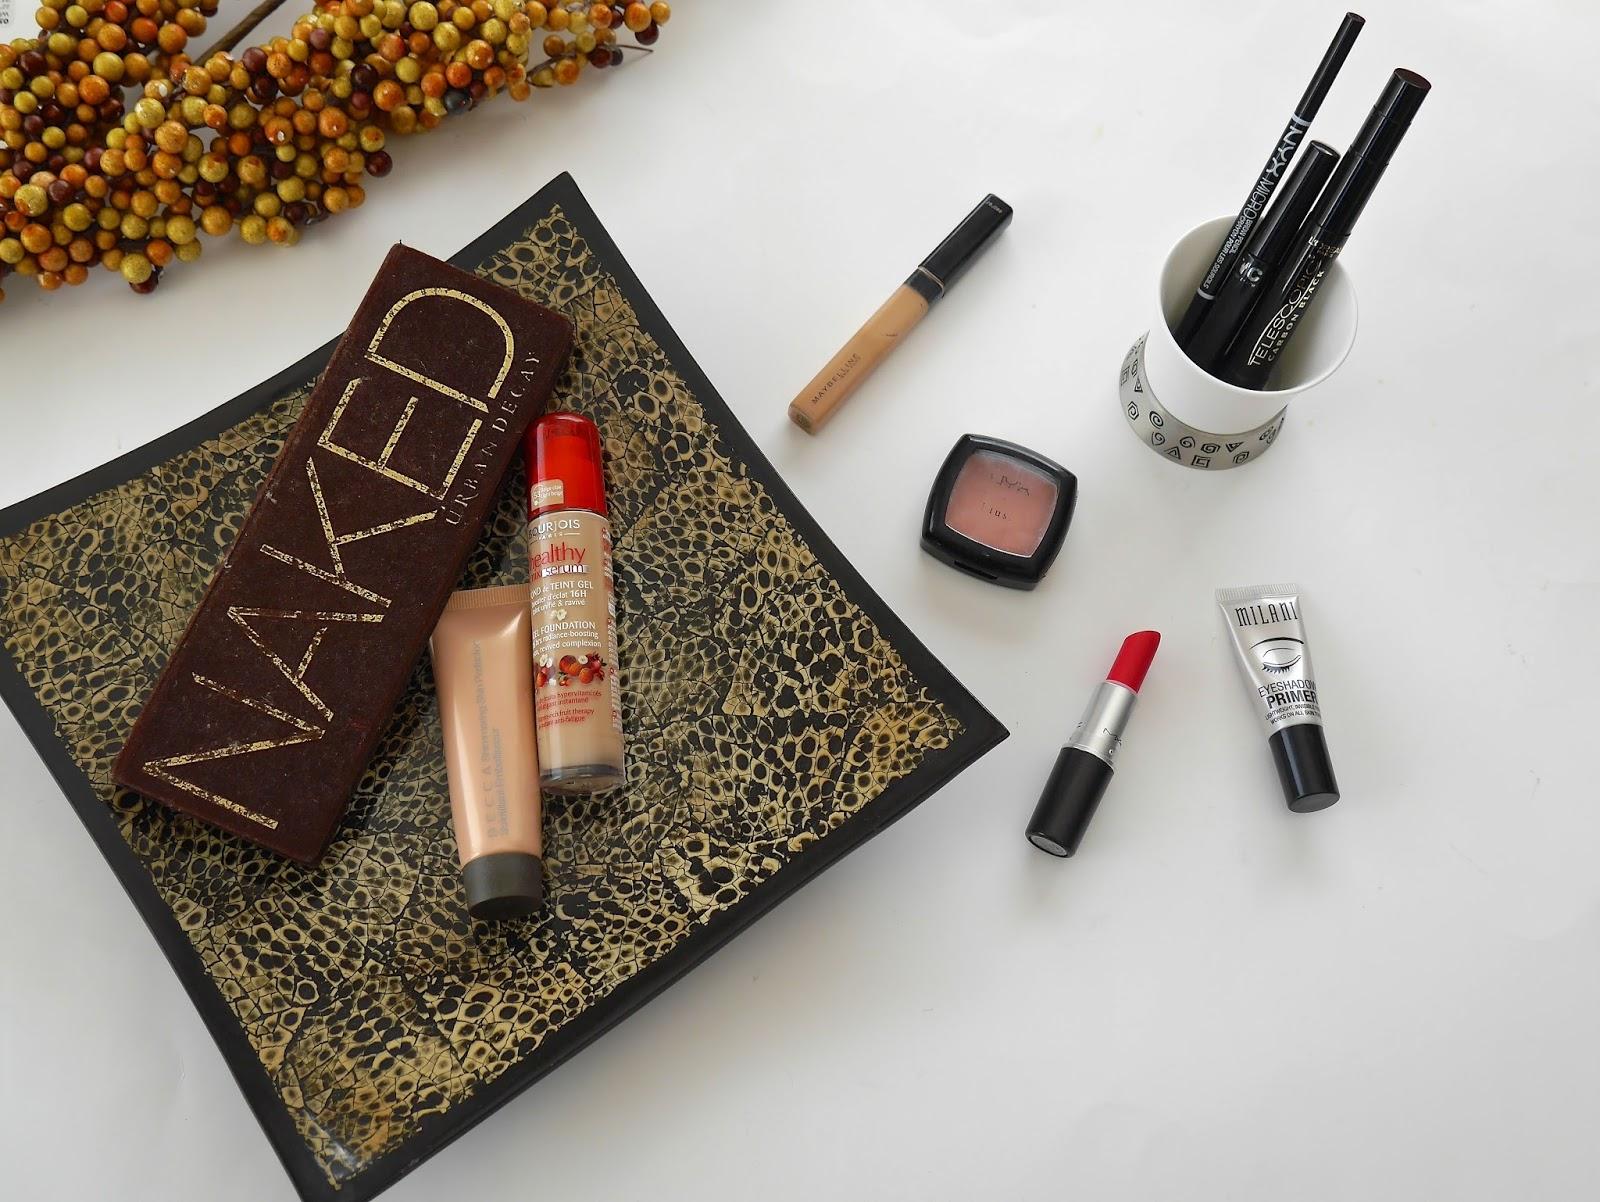 Beauty & Health, blusher, eye liner, eyebrow gel, eyebrow pencil, eyeshadow base, eyeshadows, FOTD, foundation, lipstick, mascara,